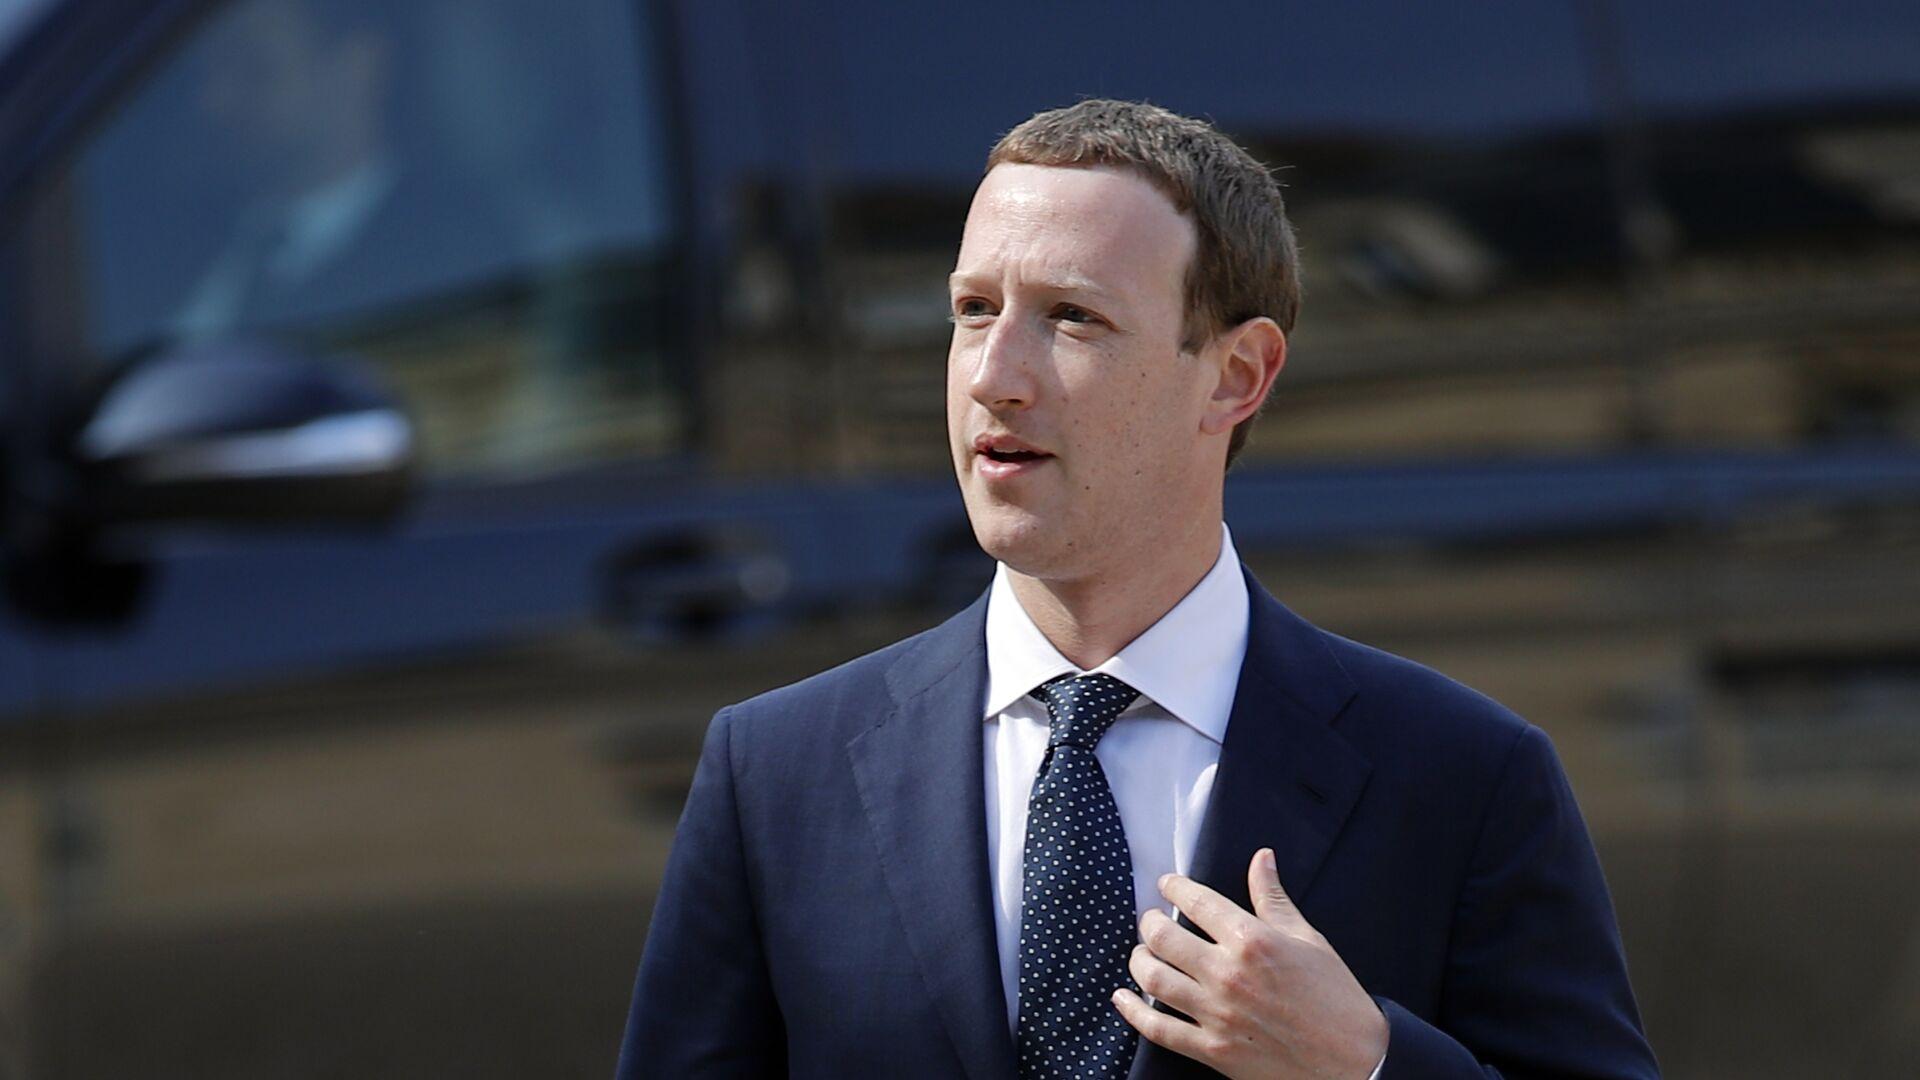 CEO di Facebook Mark Zuckerberg - Sputnik Italia, 1920, 04.04.2021